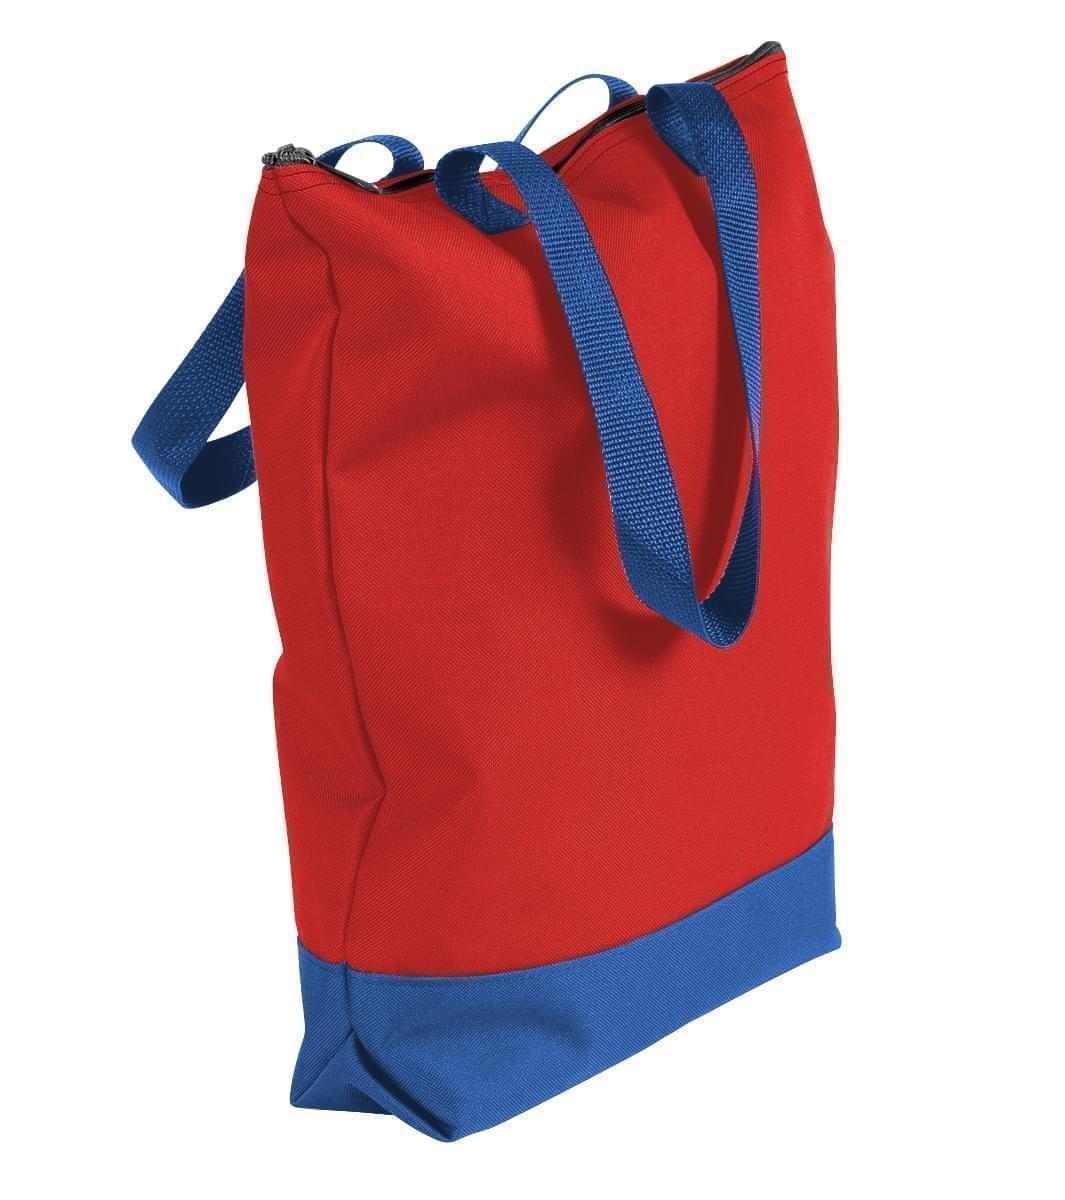 USA Made Canvas Portfolio Tote Bags, 1AAMX1-12C